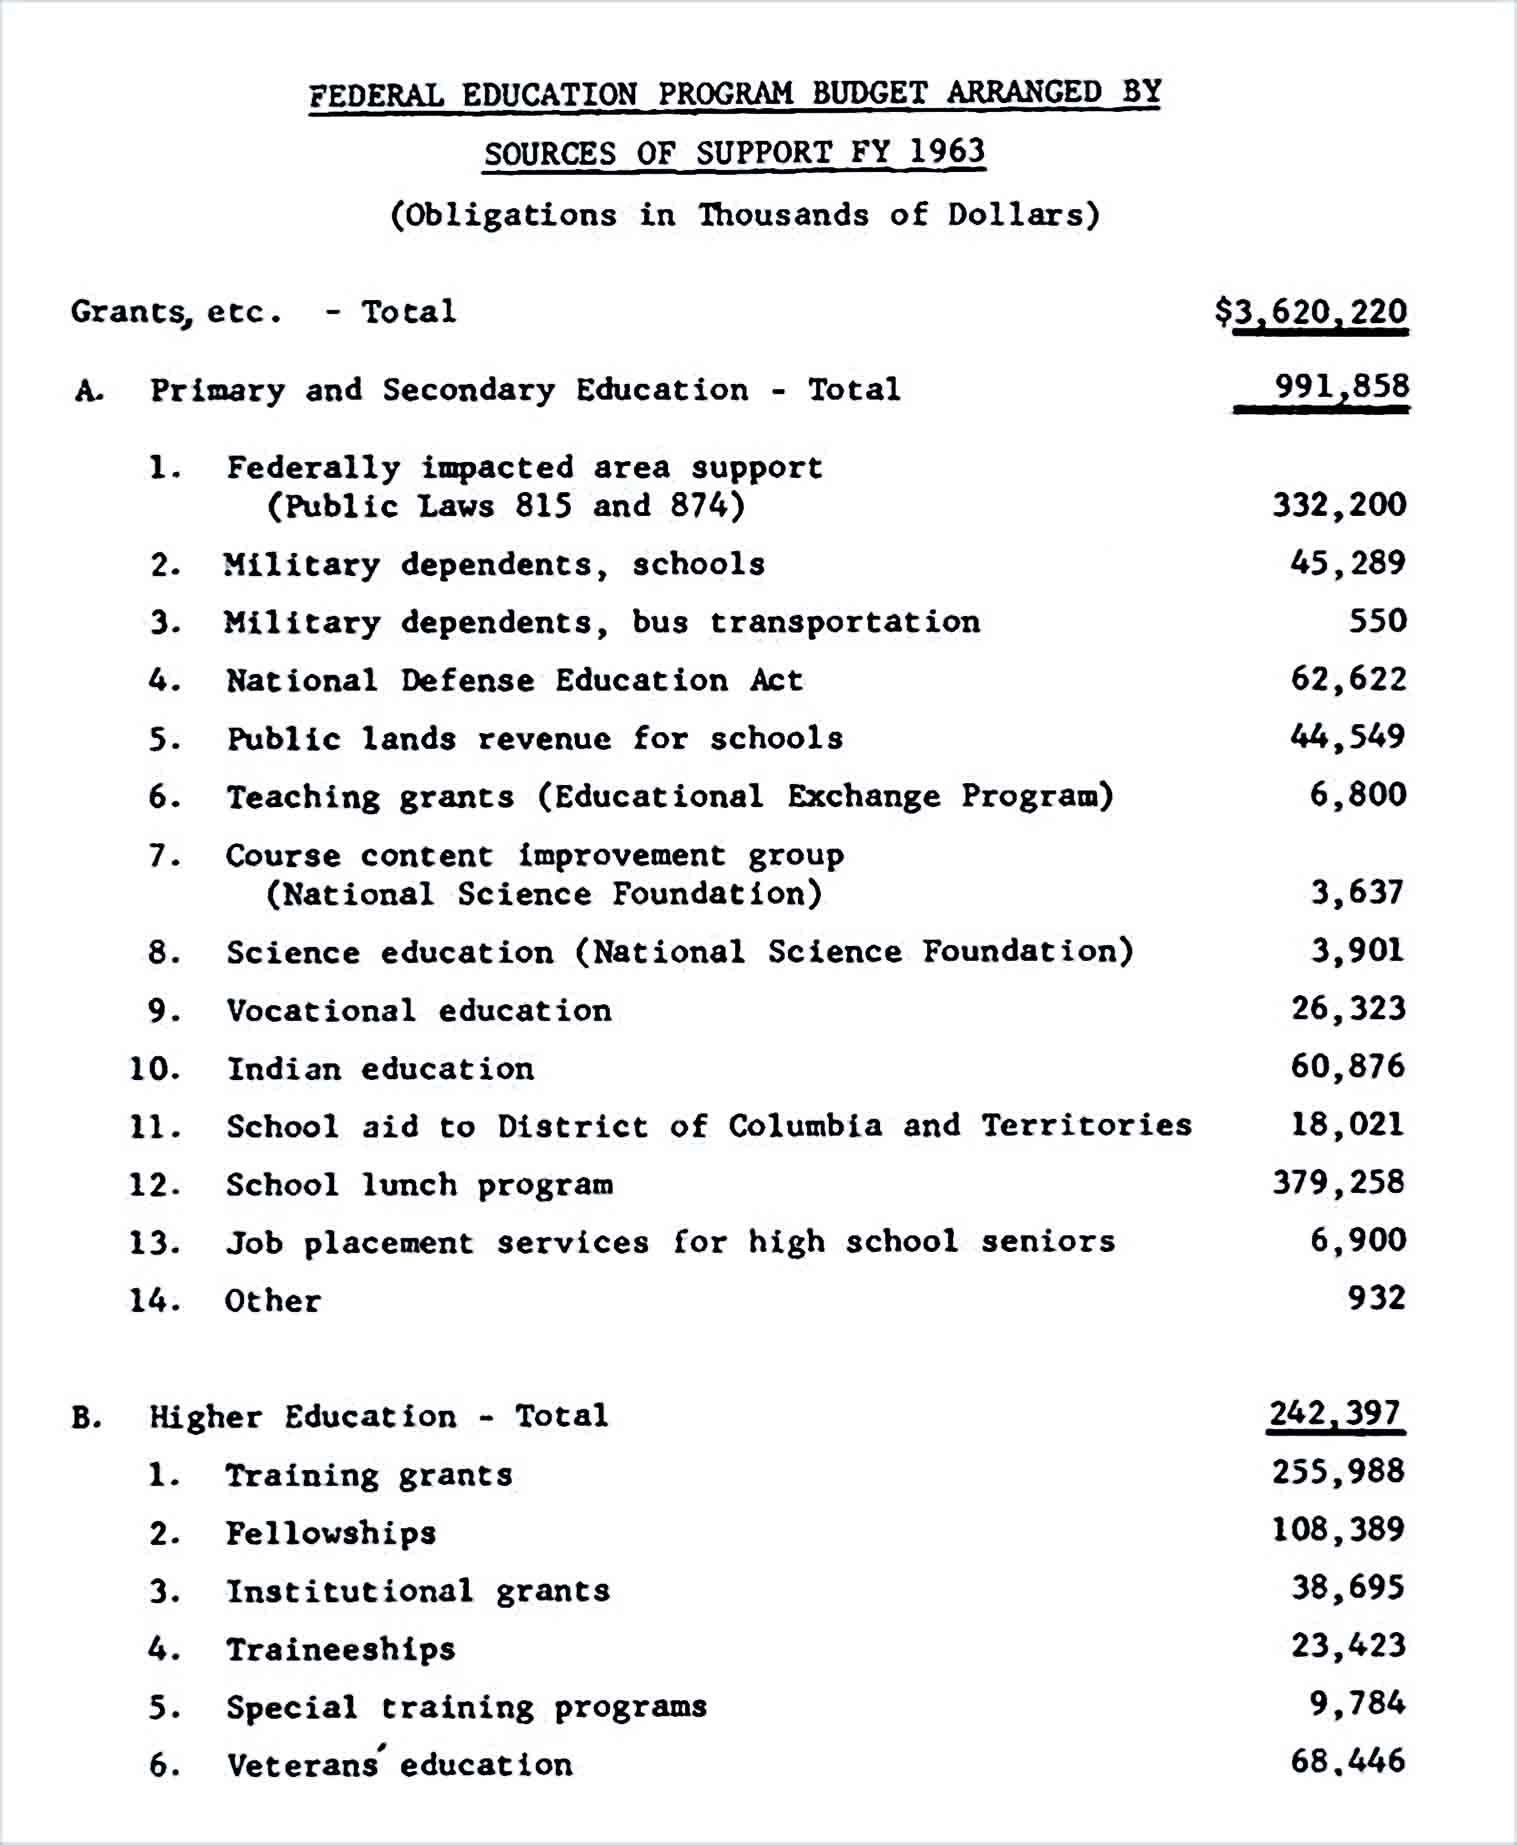 Sample Education Program Budget 1